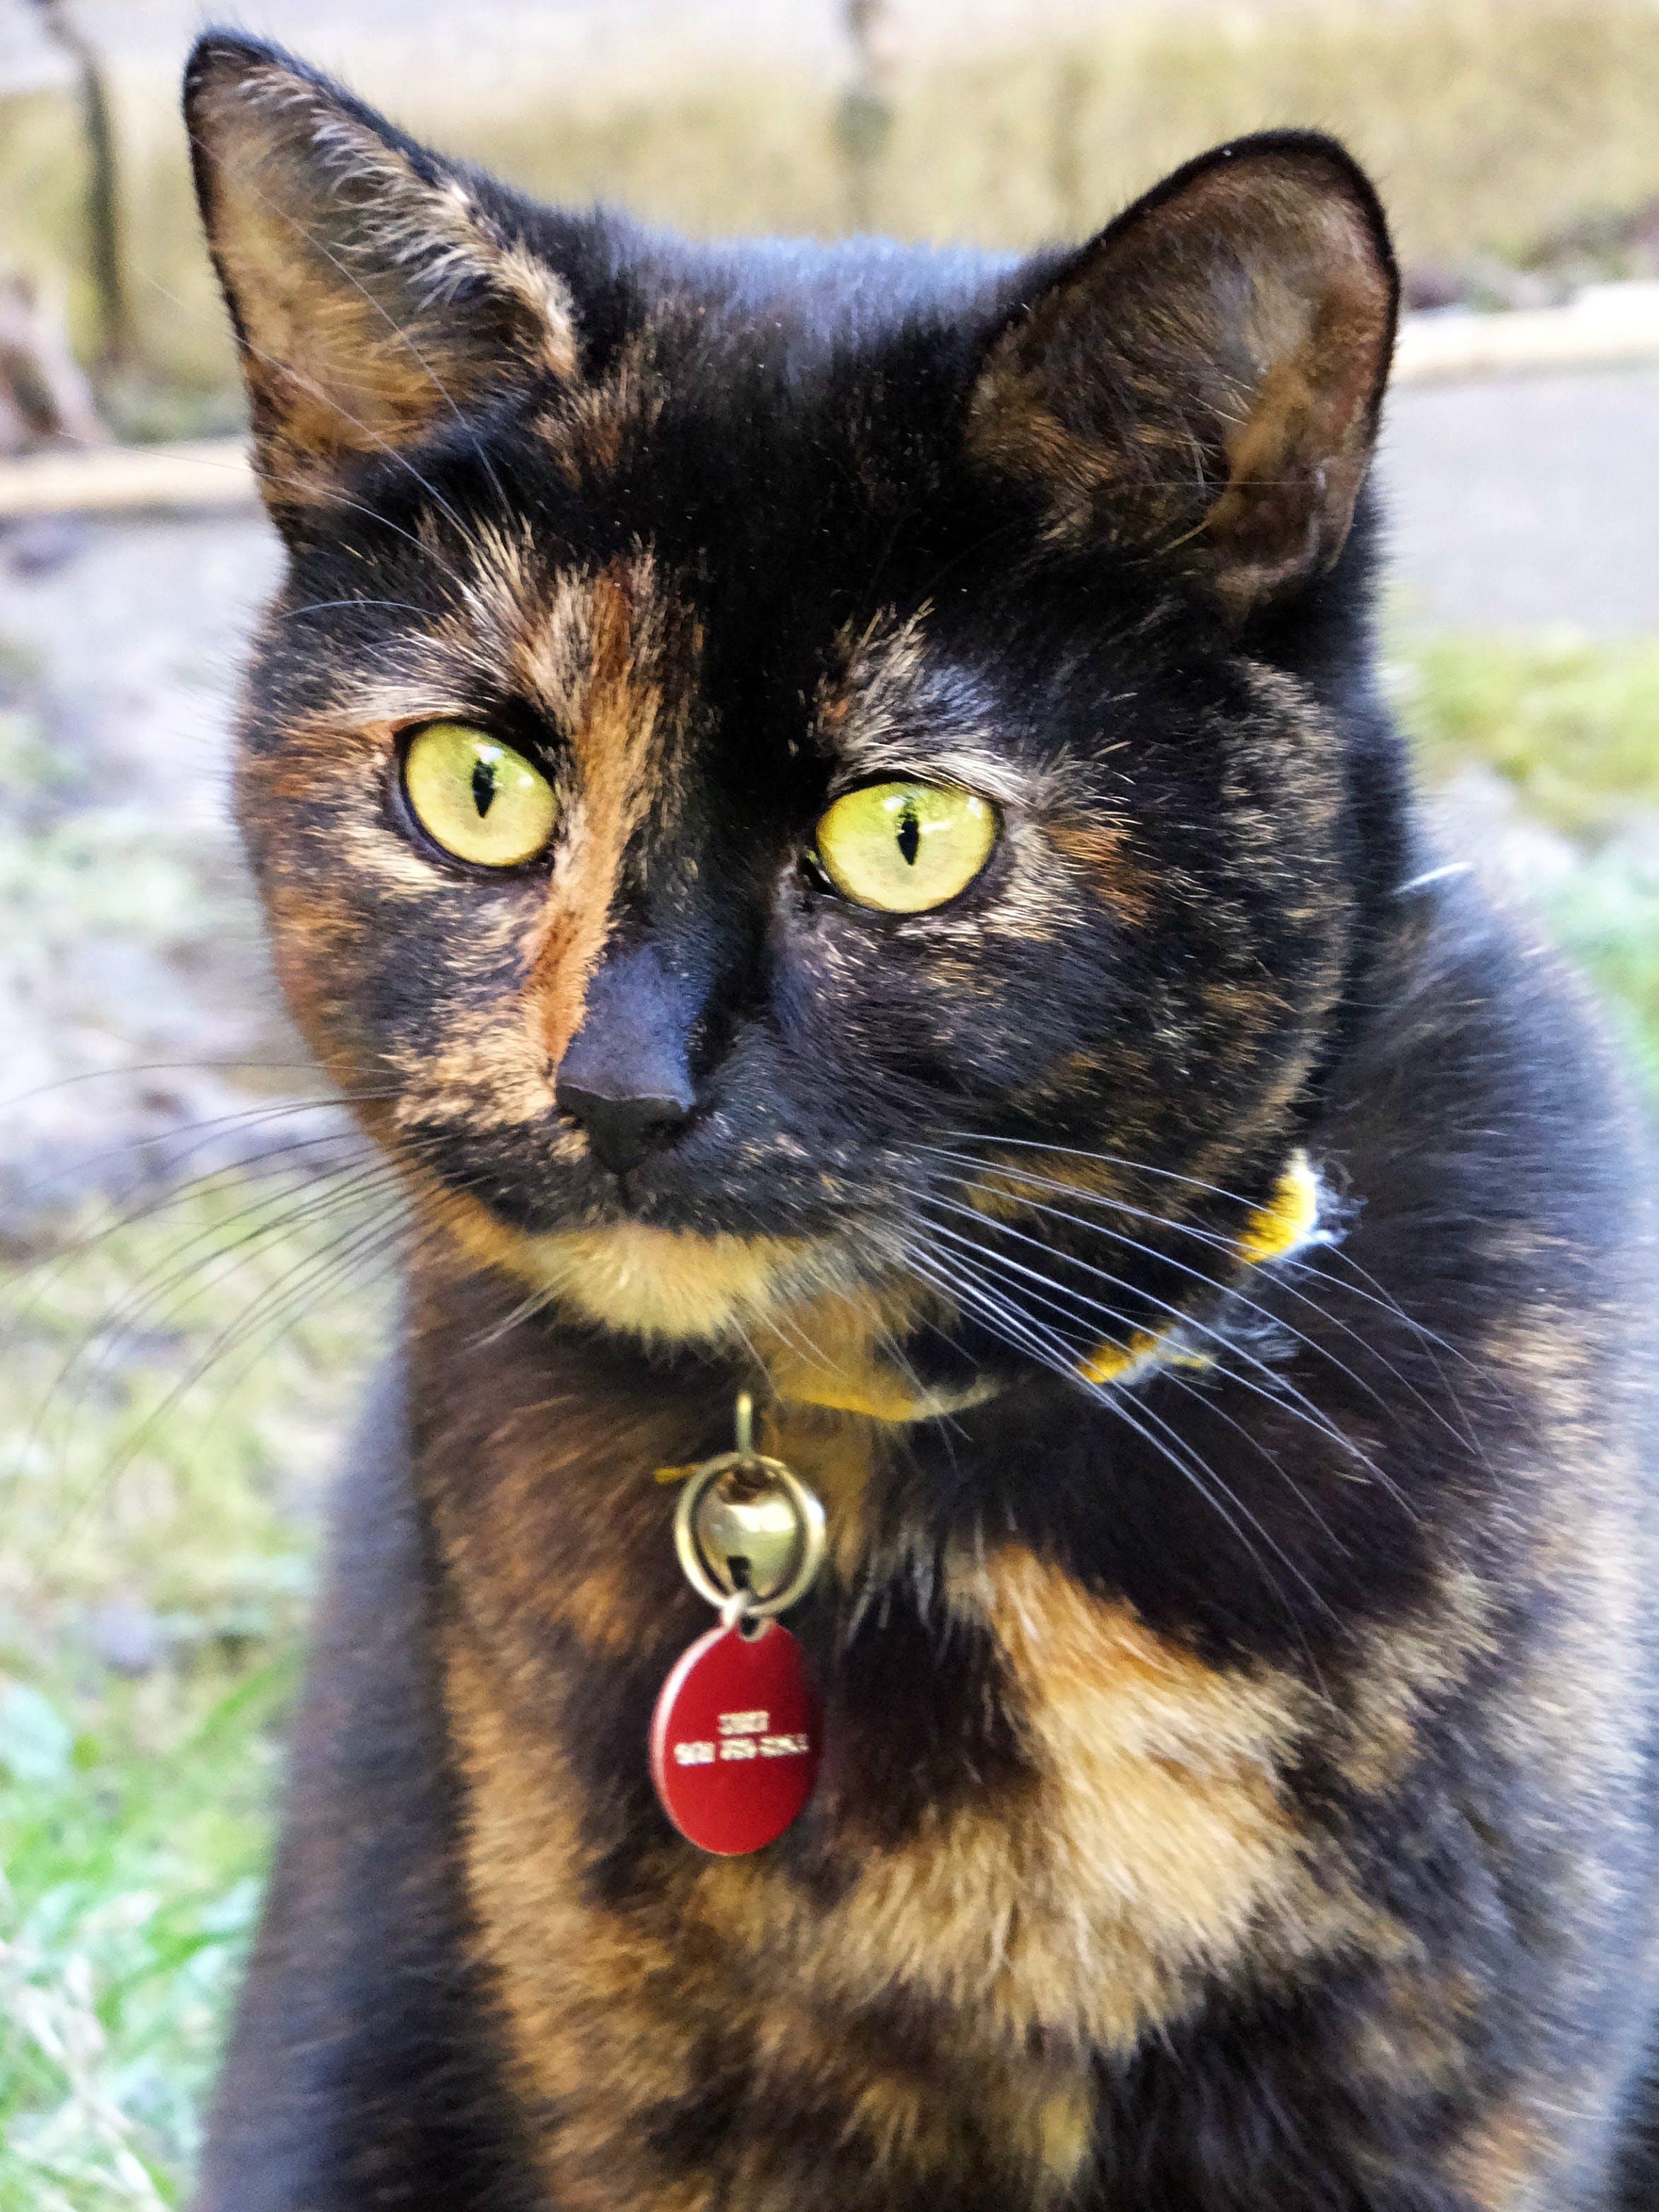 Free stock photo of cat, cats eyes, pets, tortoiseshell cat